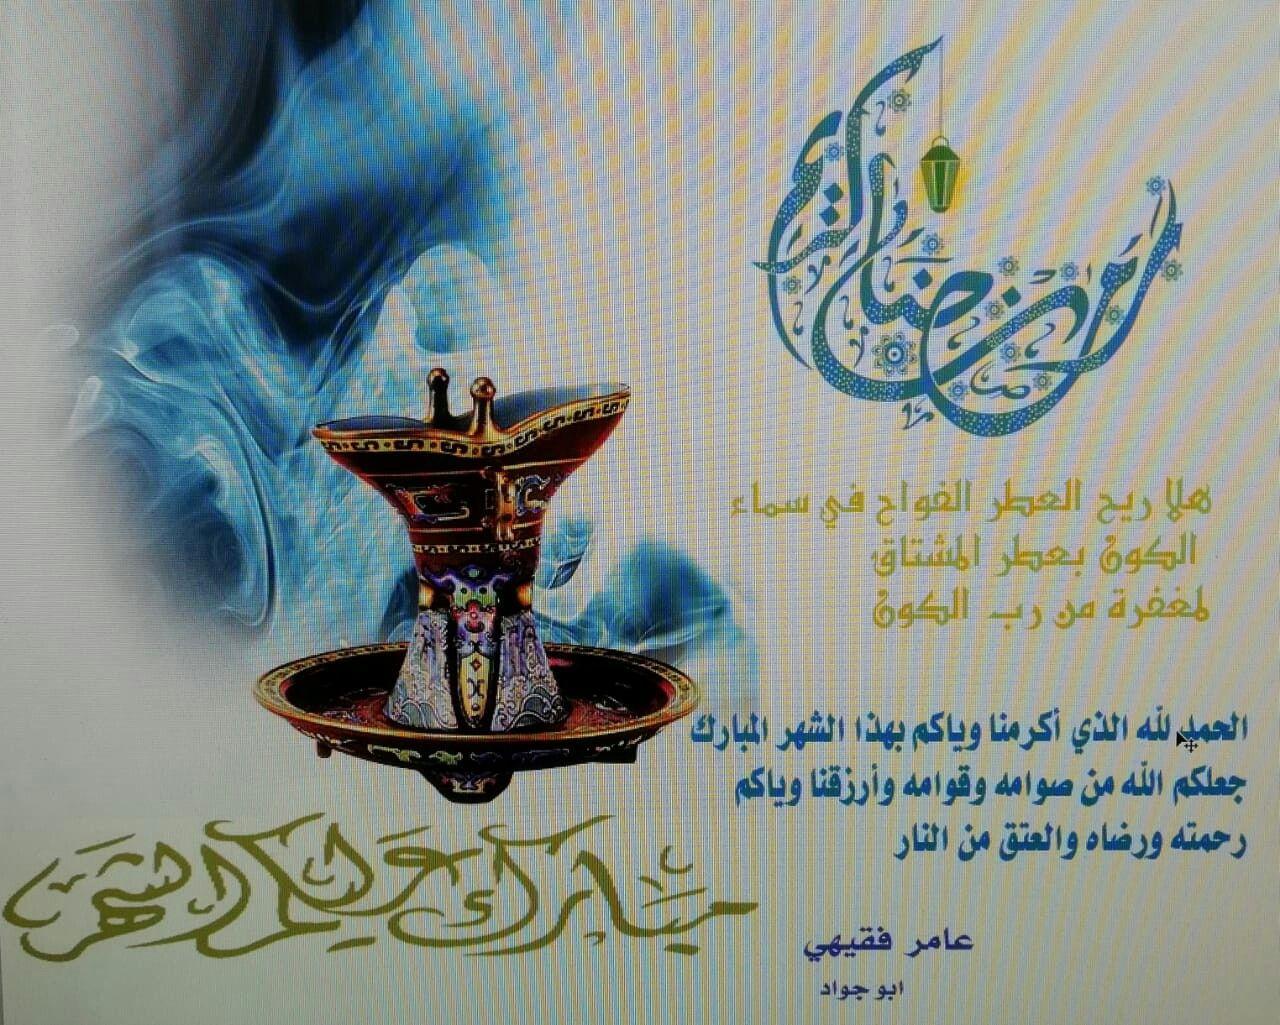 Pin By Ramya On شهر رمضان المبارك و الحج العمرة Movie Posters Poster Art